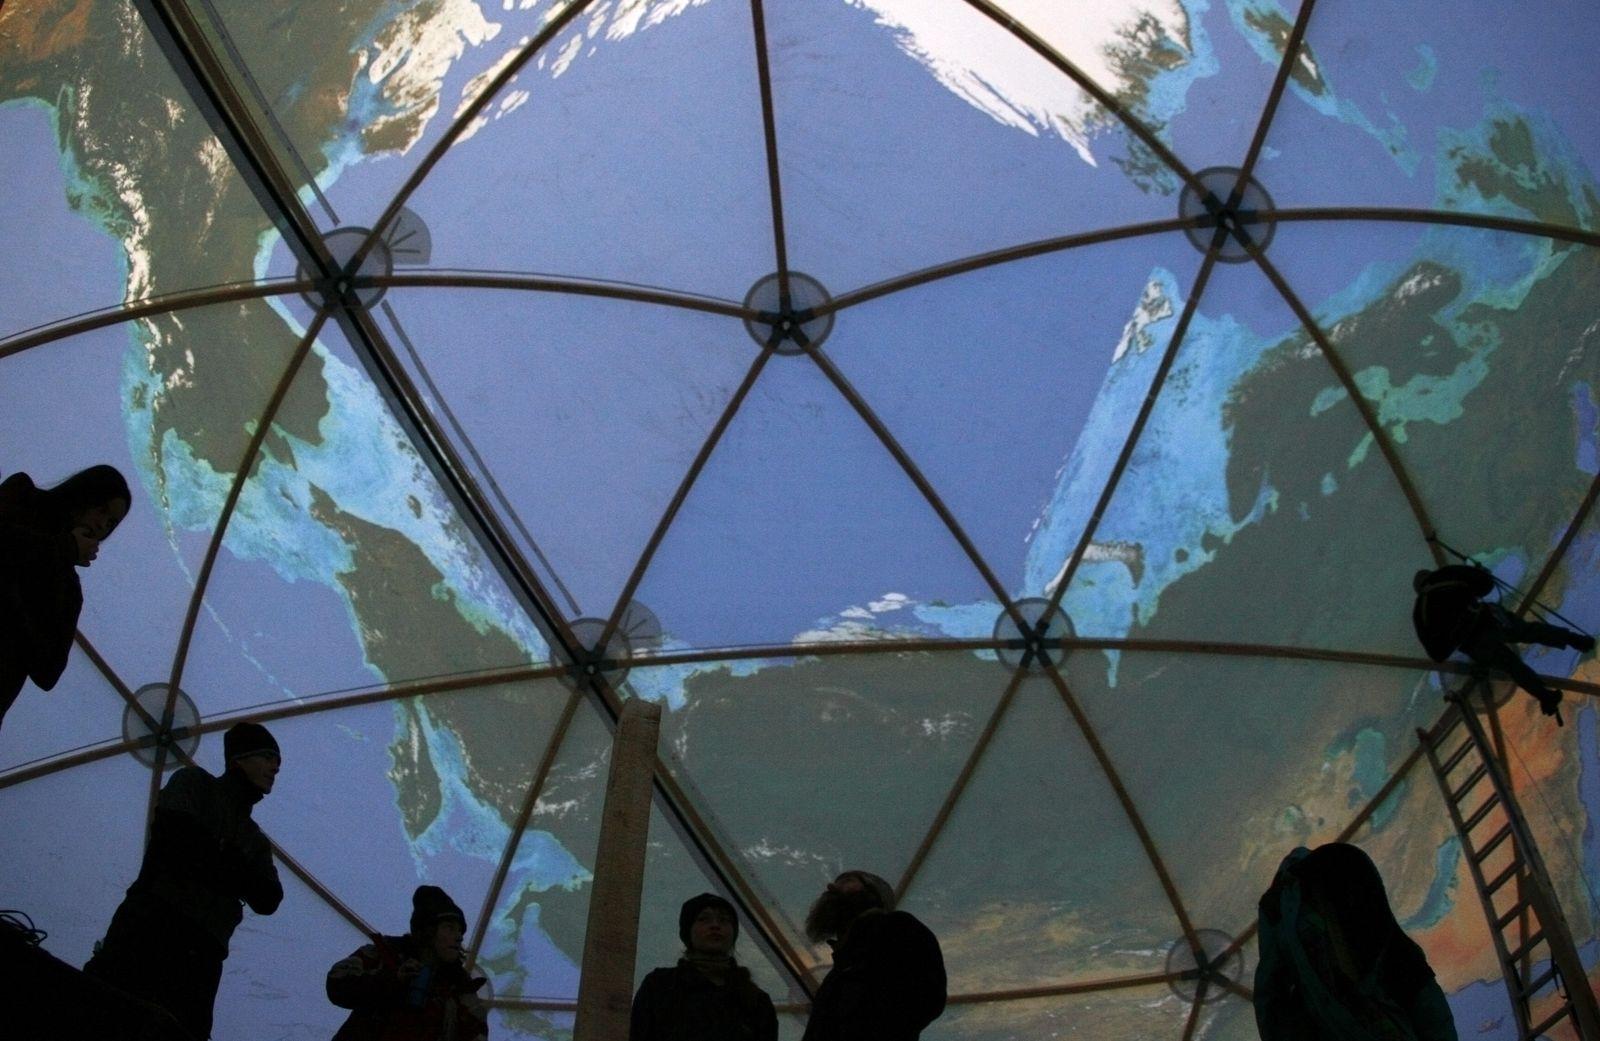 Globus Model / Greepeace / Klimawandel